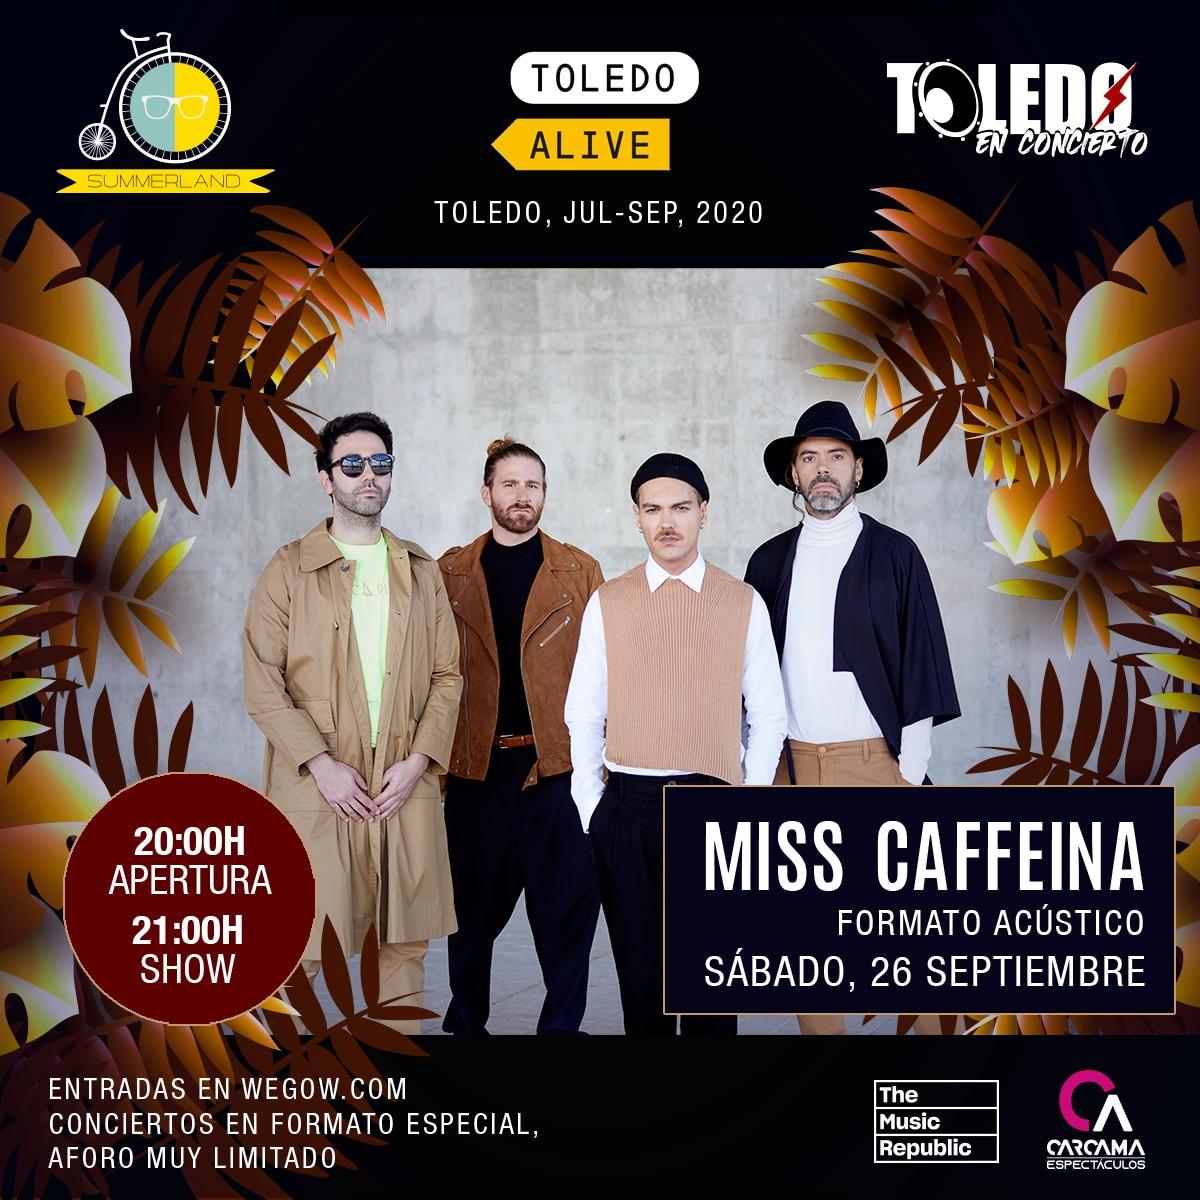 Concierto de Miss Caffeina - Toledo Alive 2020